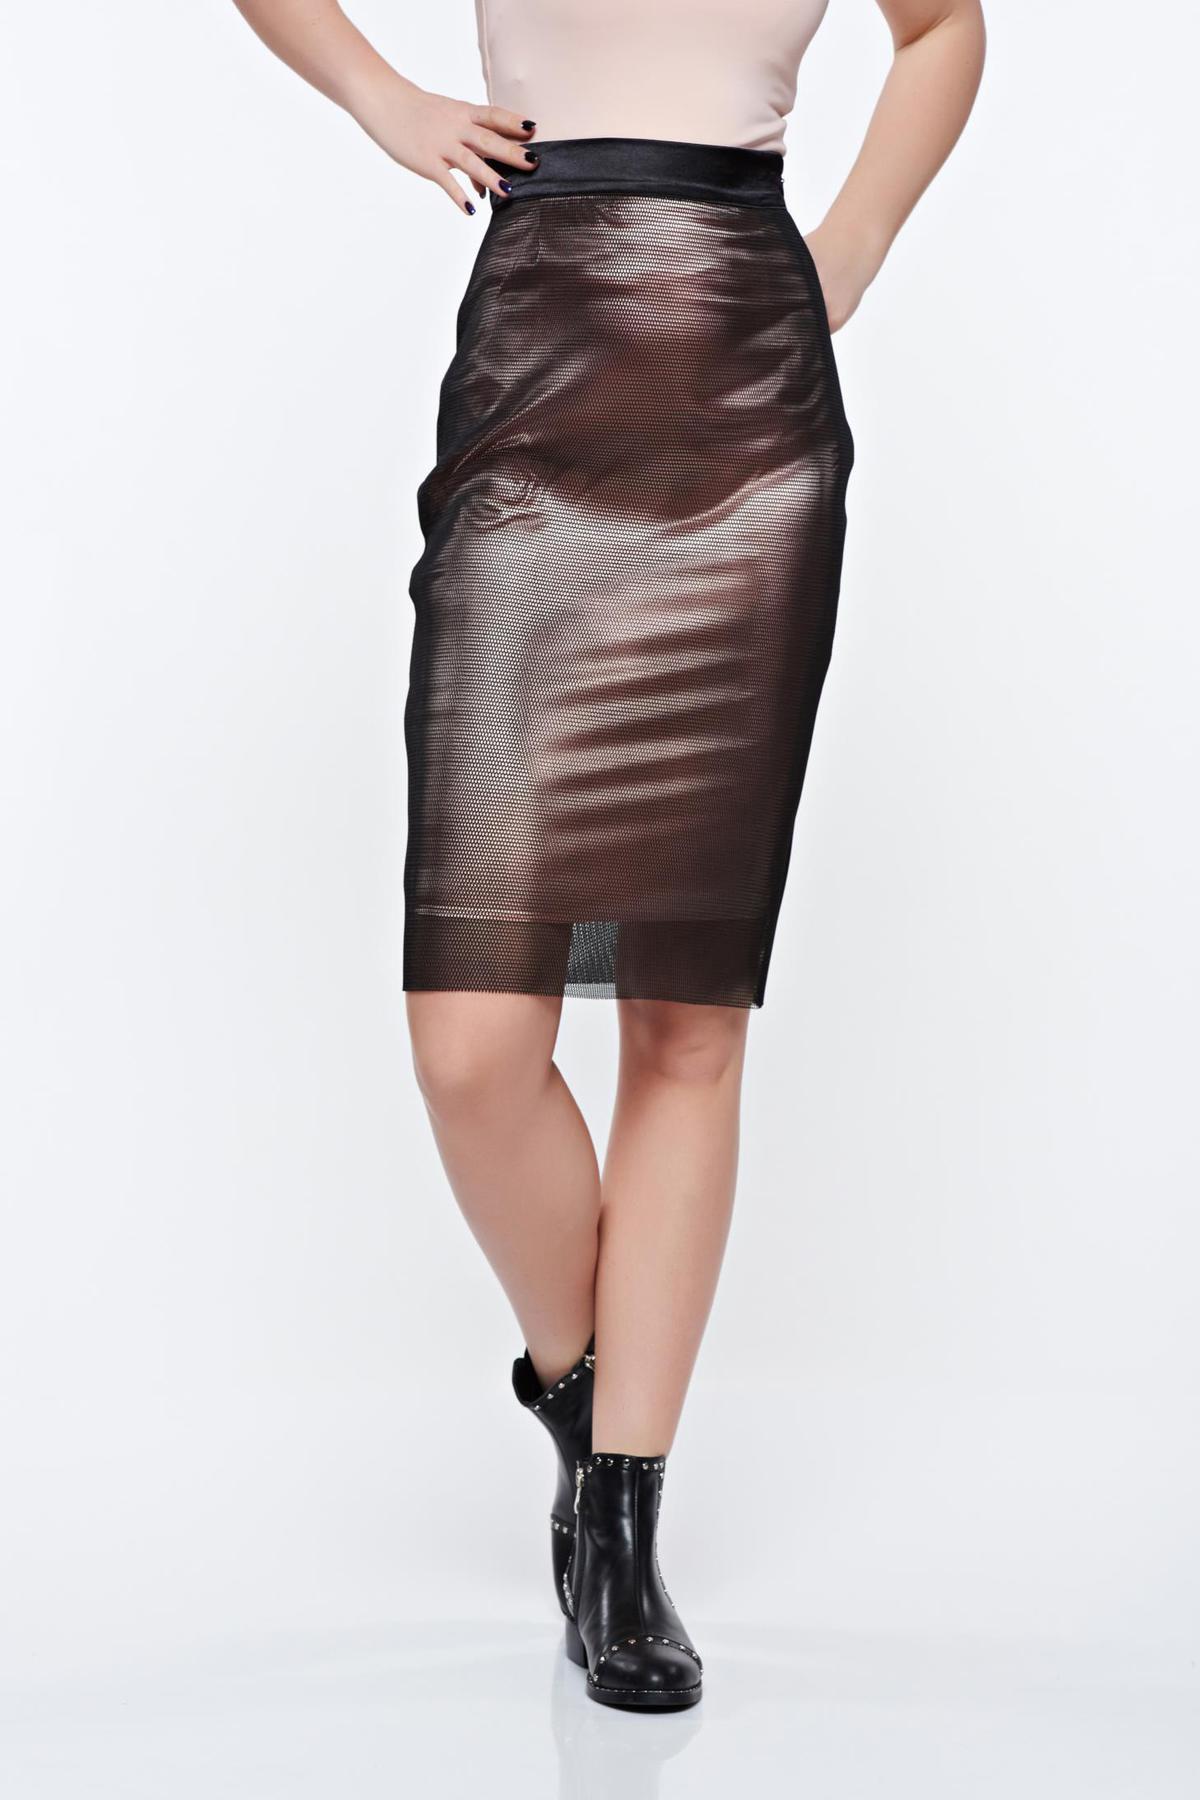 Fusta PrettyGirl neagra de party cu talie inalta din material neelastic tip plasa captusita pe interior